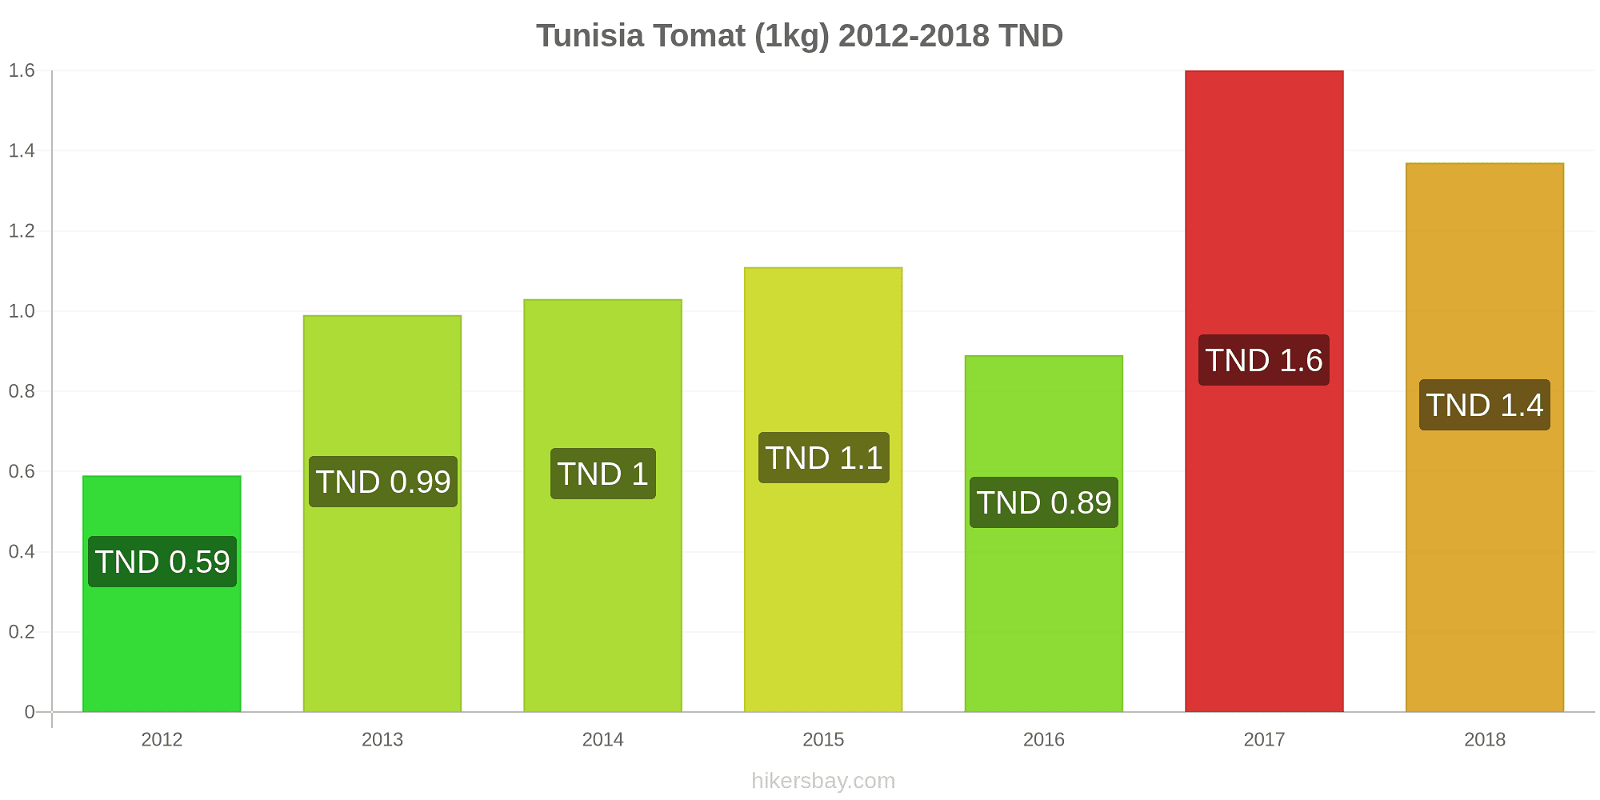 Tunisia prisendringer Tomat (1kg) hikersbay.com